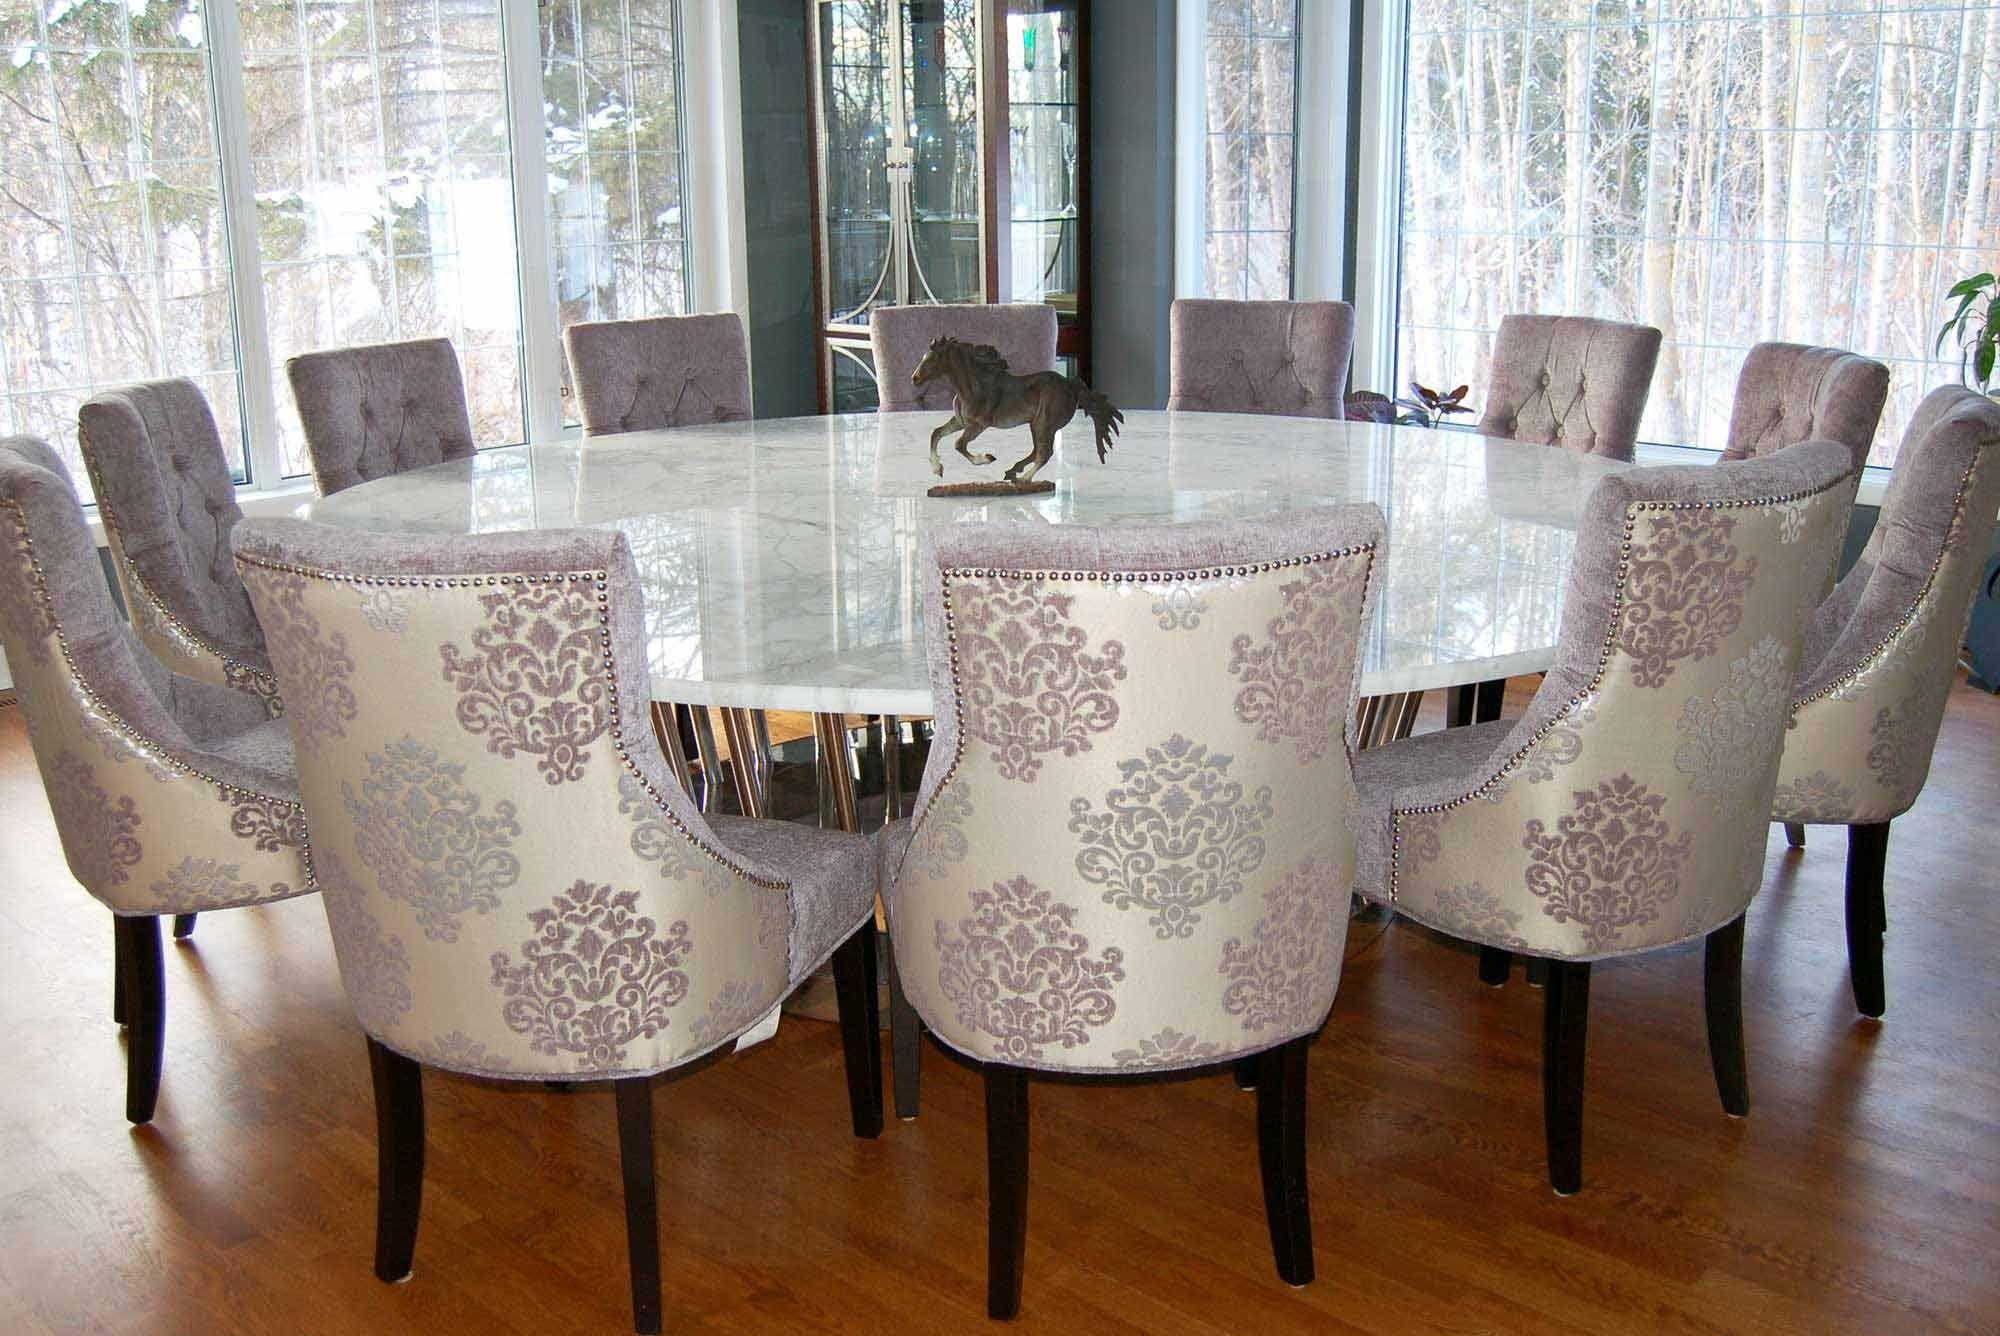 Small round kitchen table  Large Round Kitchen Table Sets  manageditservicesatlanta